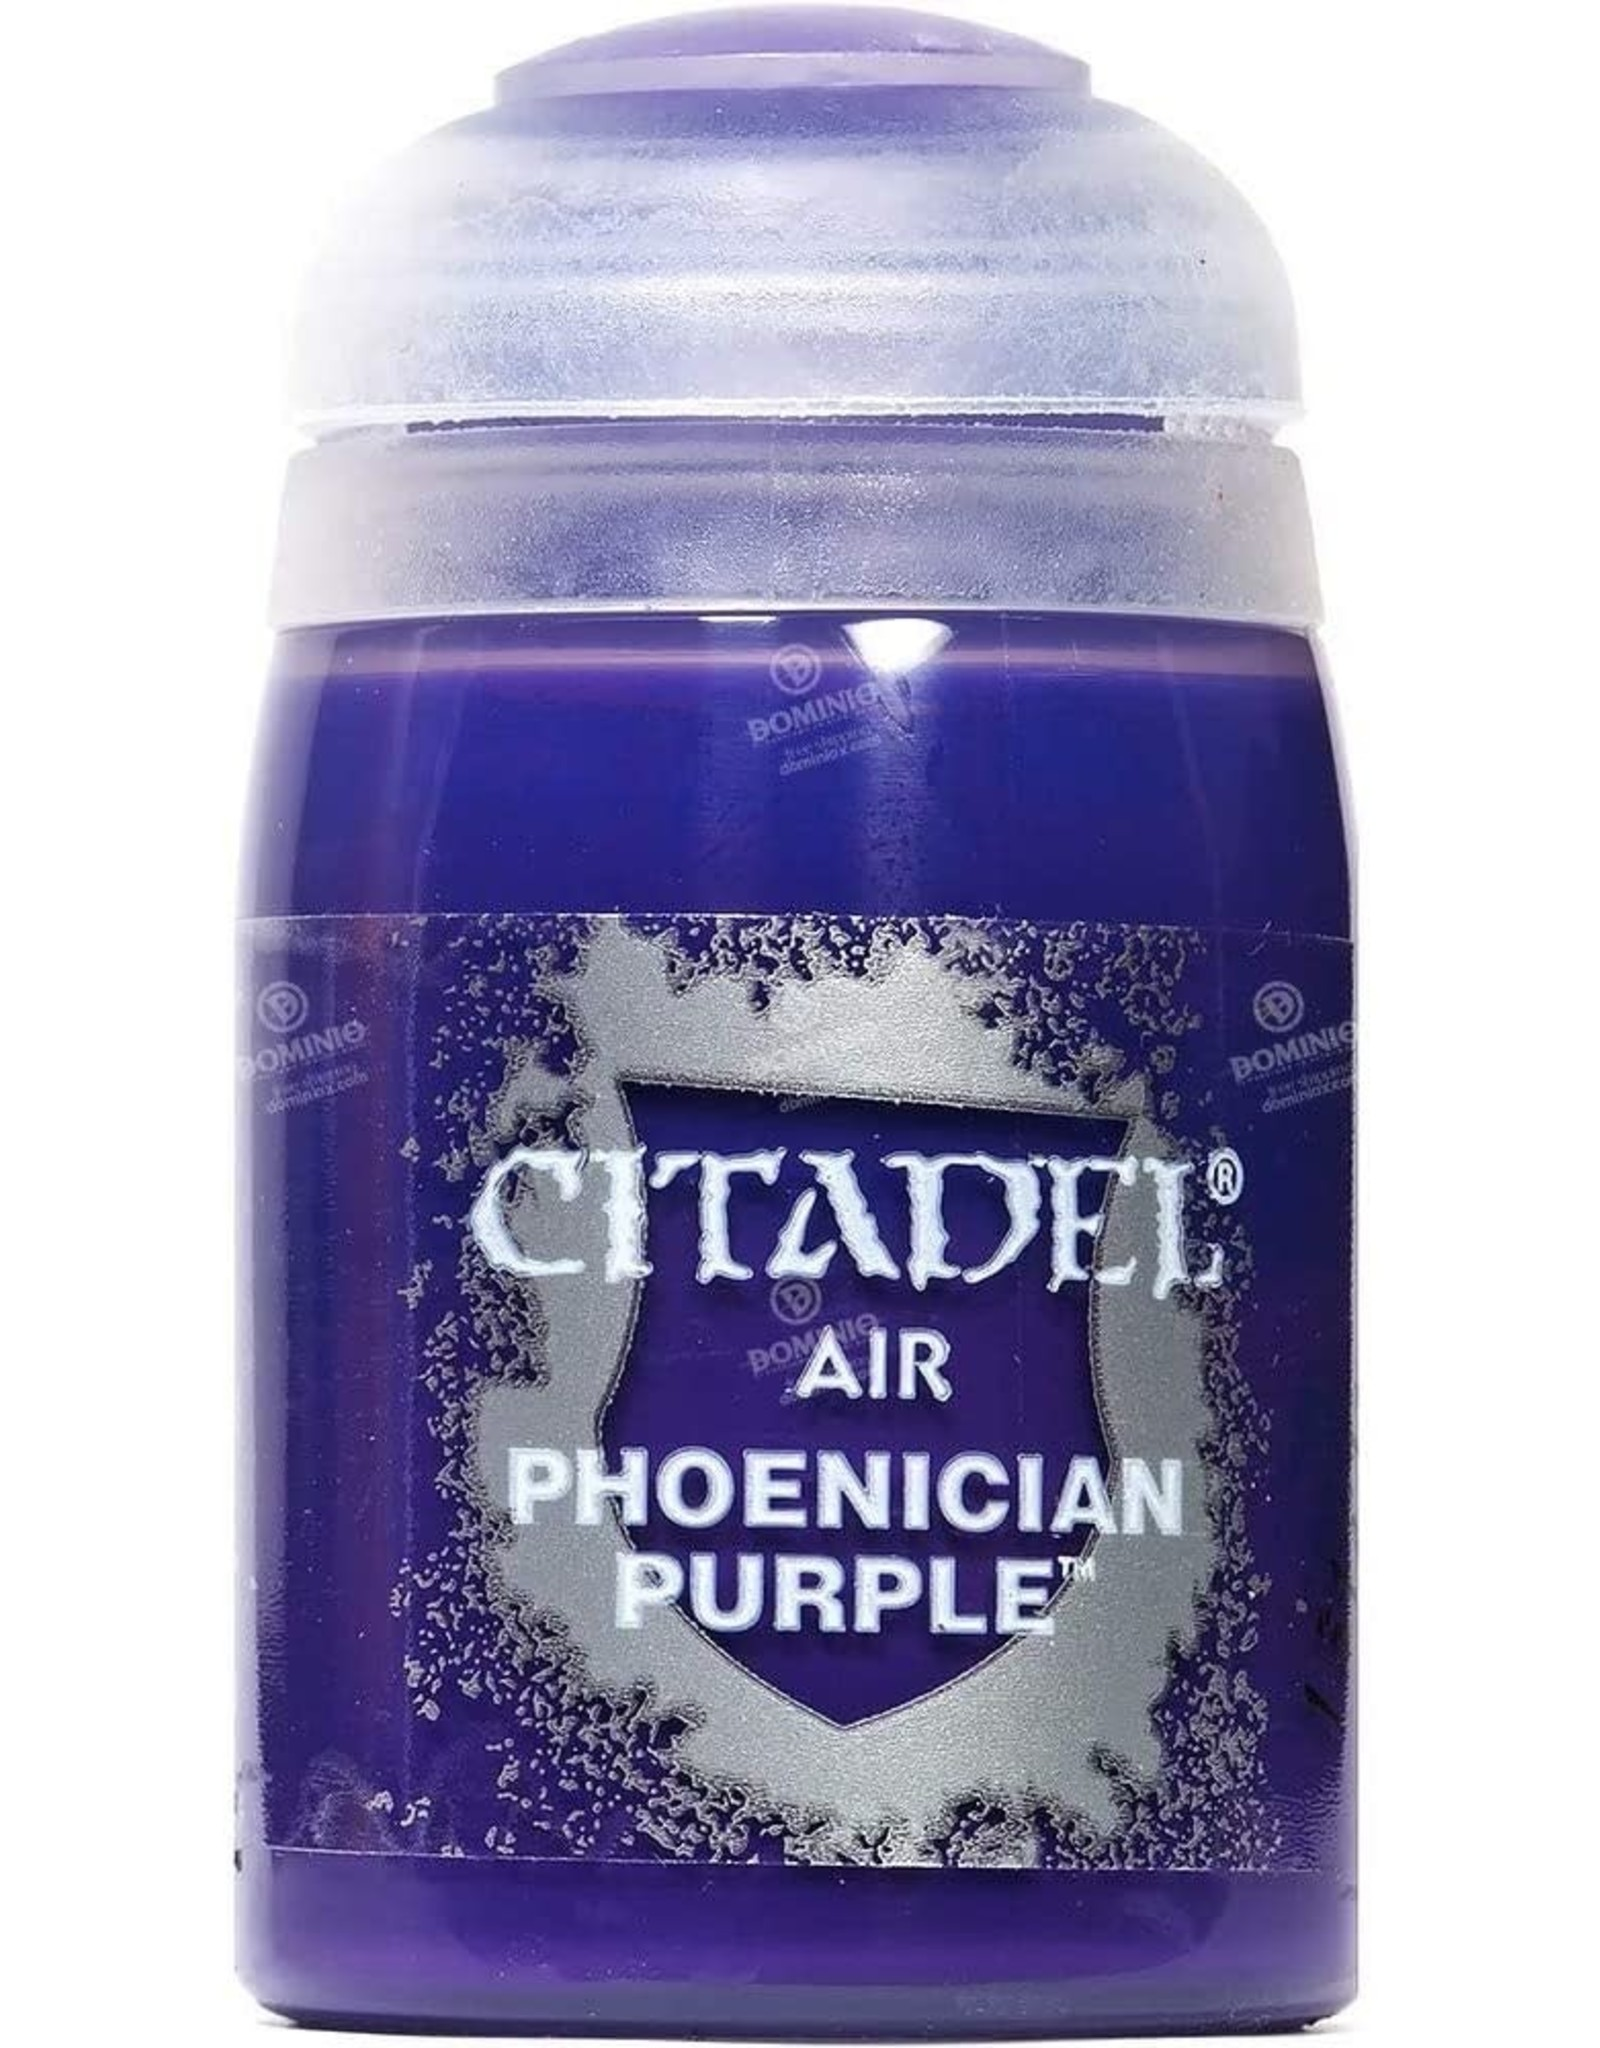 Games Workshop Citadel Paint: Phoenician Purple Air (24 ml)